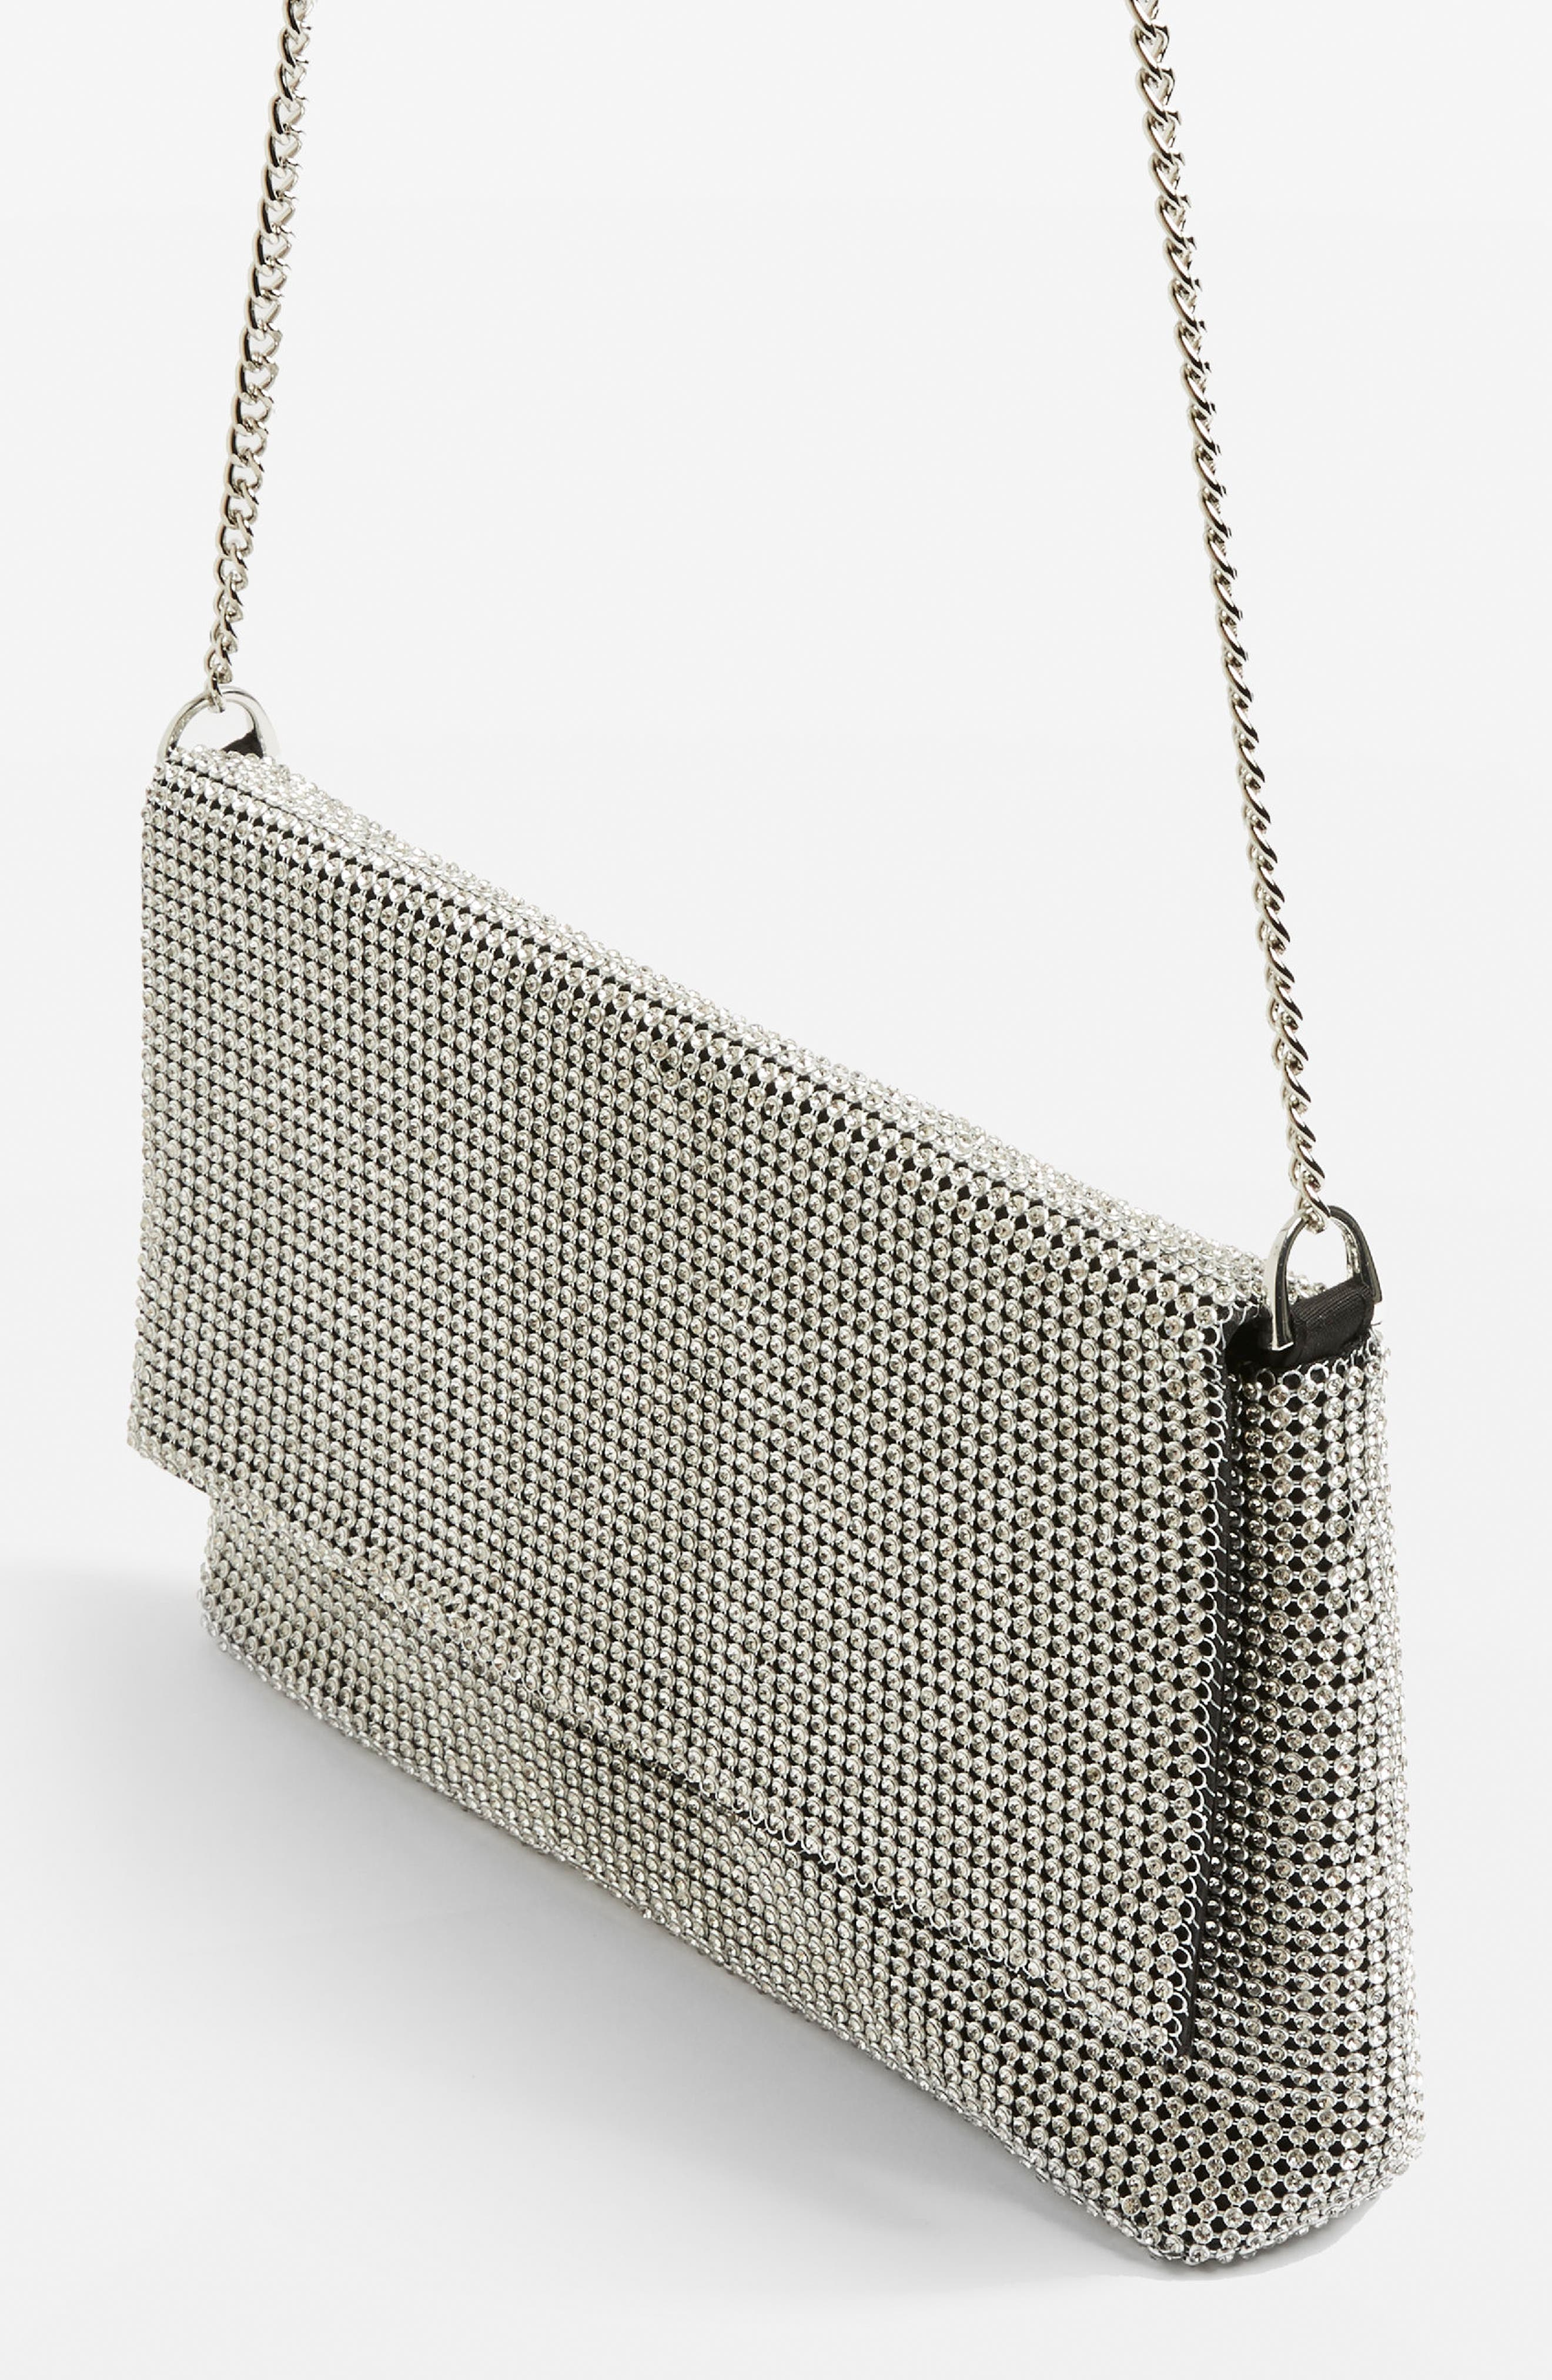 Diana Diamante Clutch Bag,                             Alternate thumbnail 4, color,